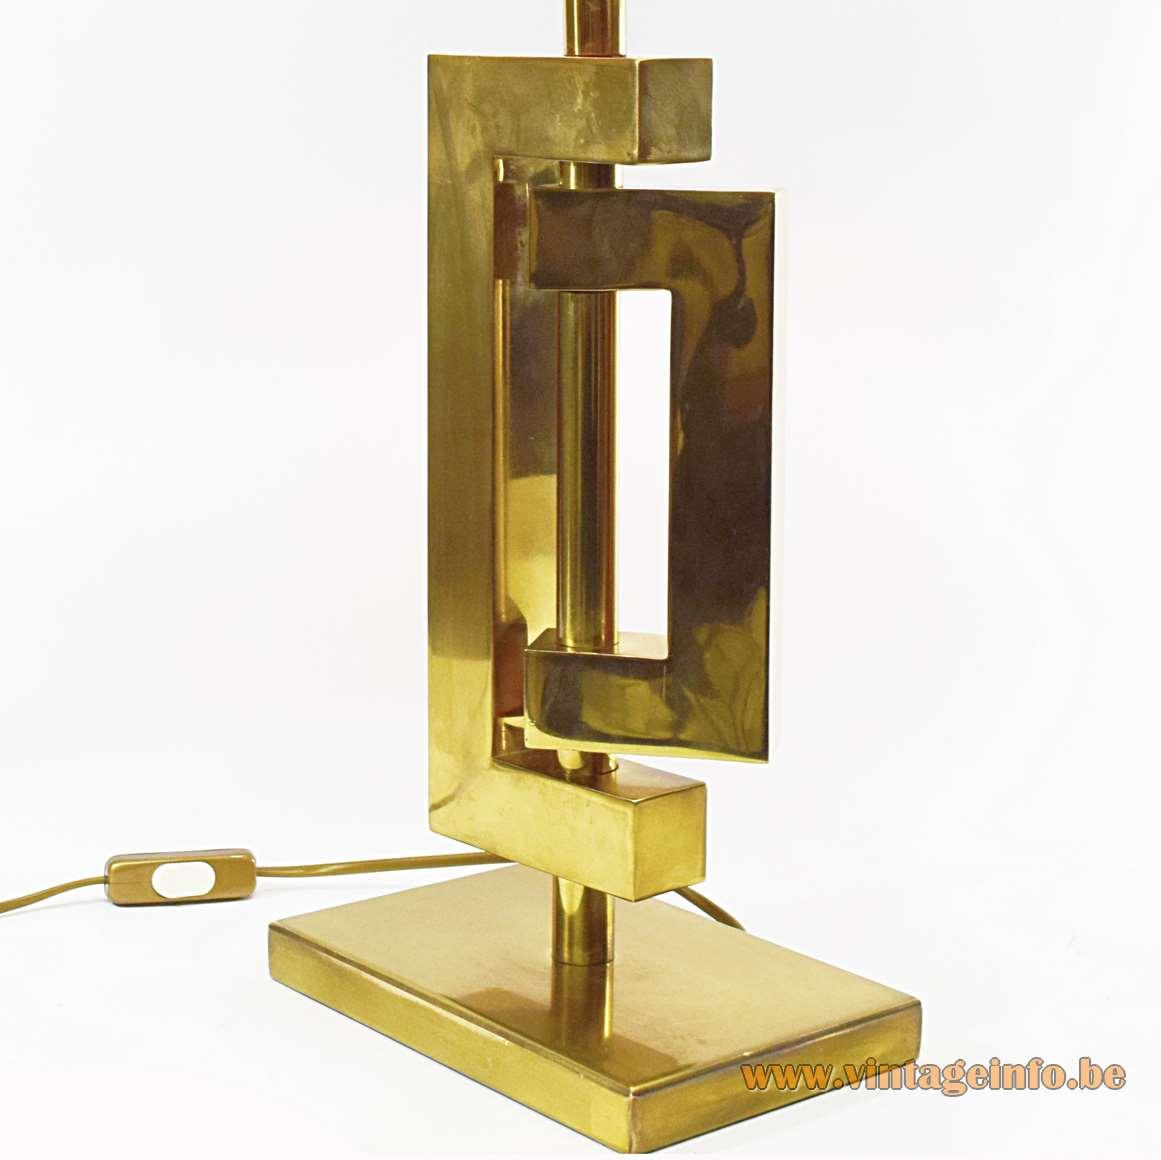 Romeo Rega Brass Table Lamp geometric sculptural square tubular sections rectangular base 1970s 1980s MCM